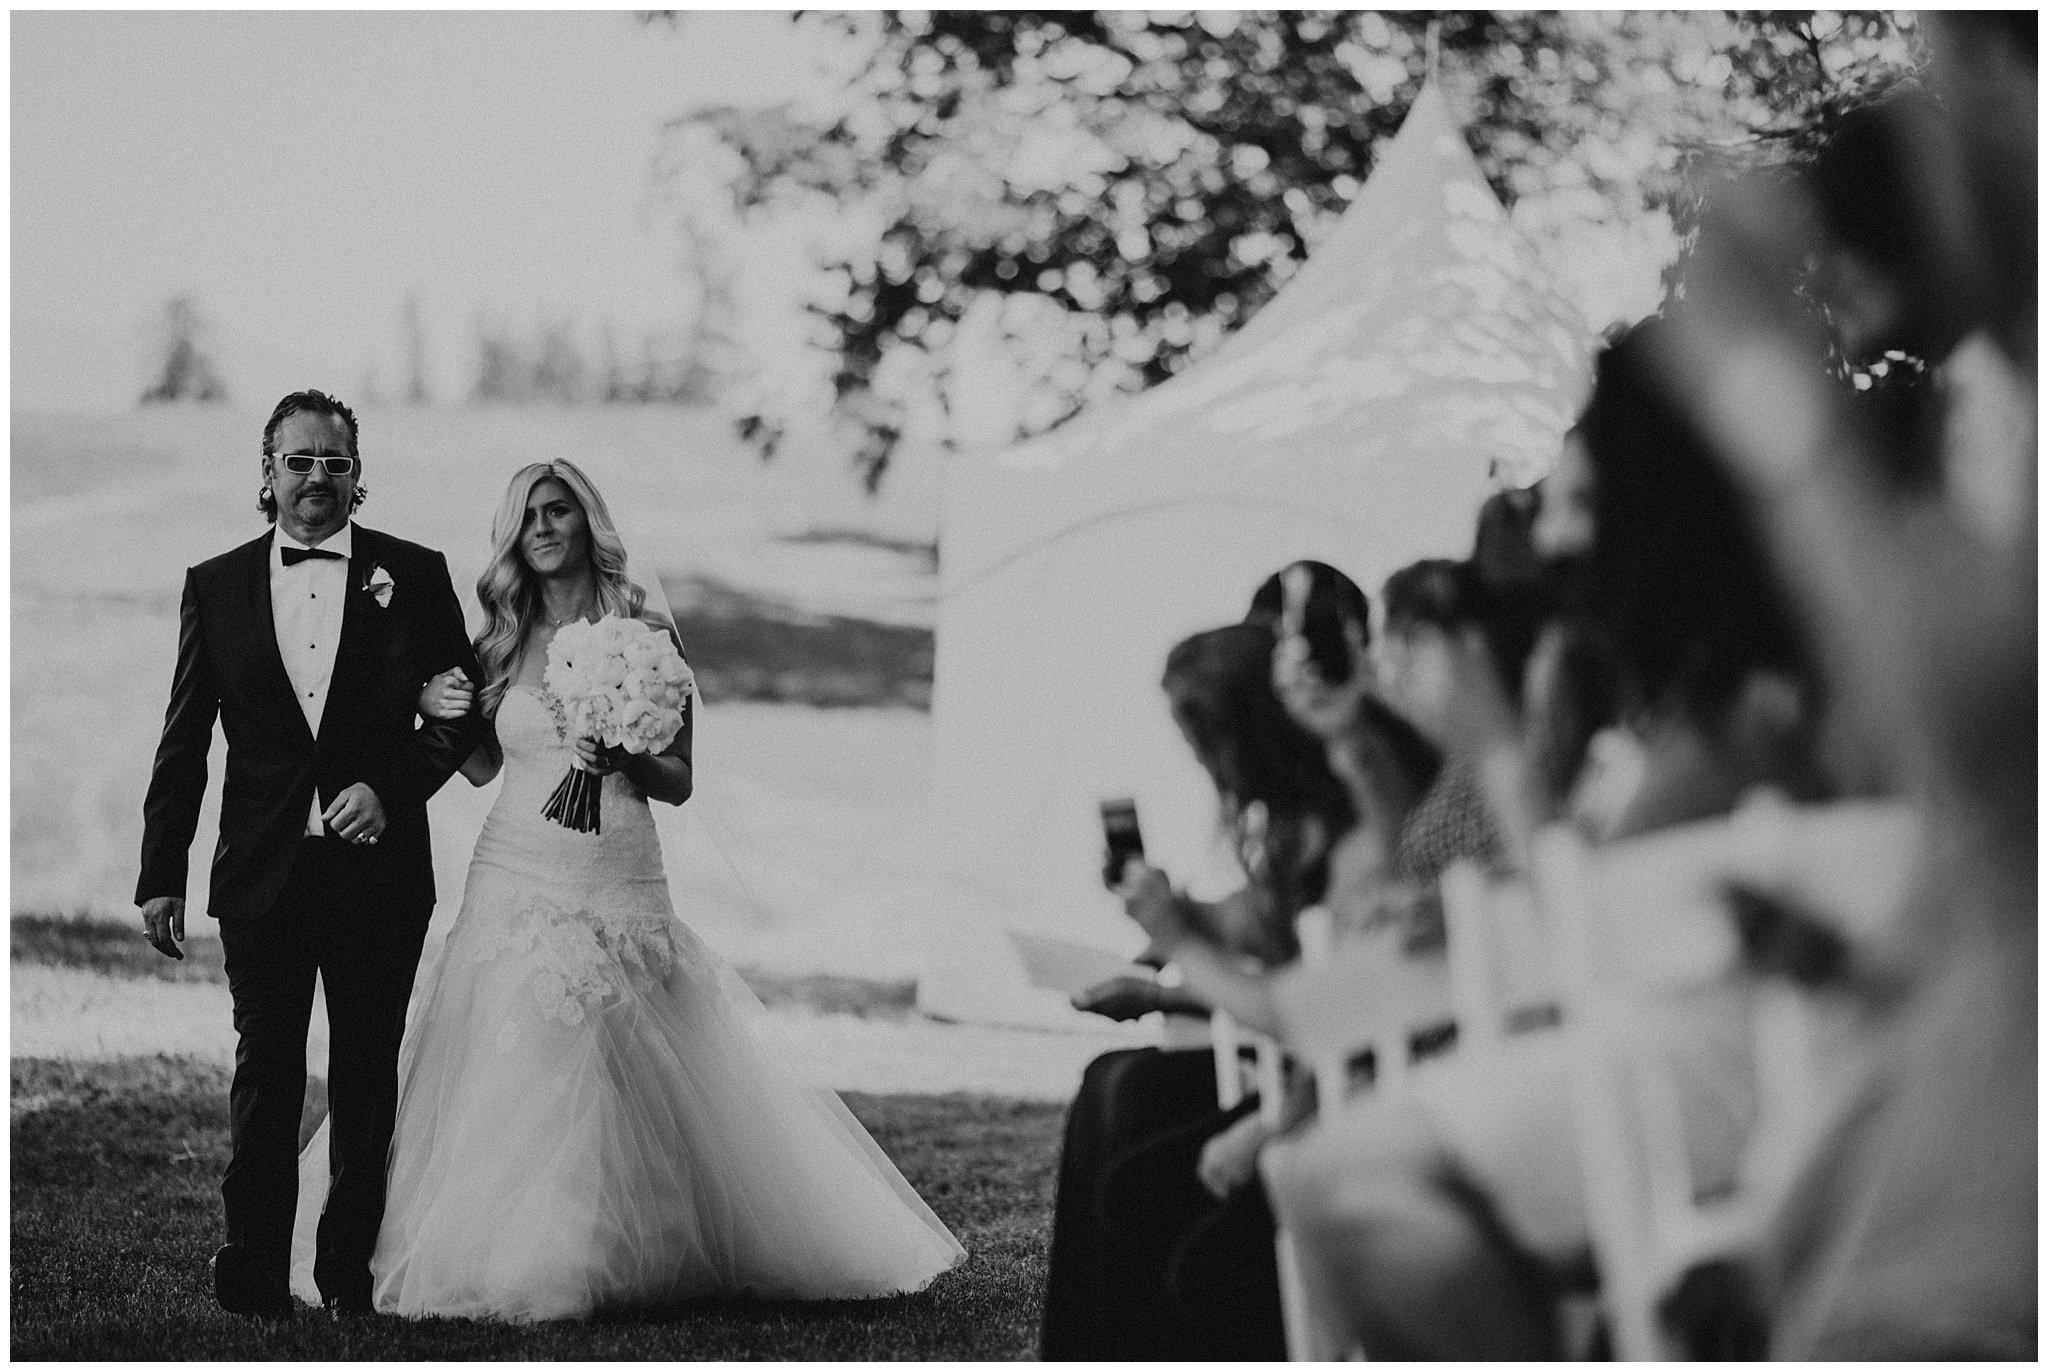 mt-lehman-winery-wedding-abbotsford-02.JPG